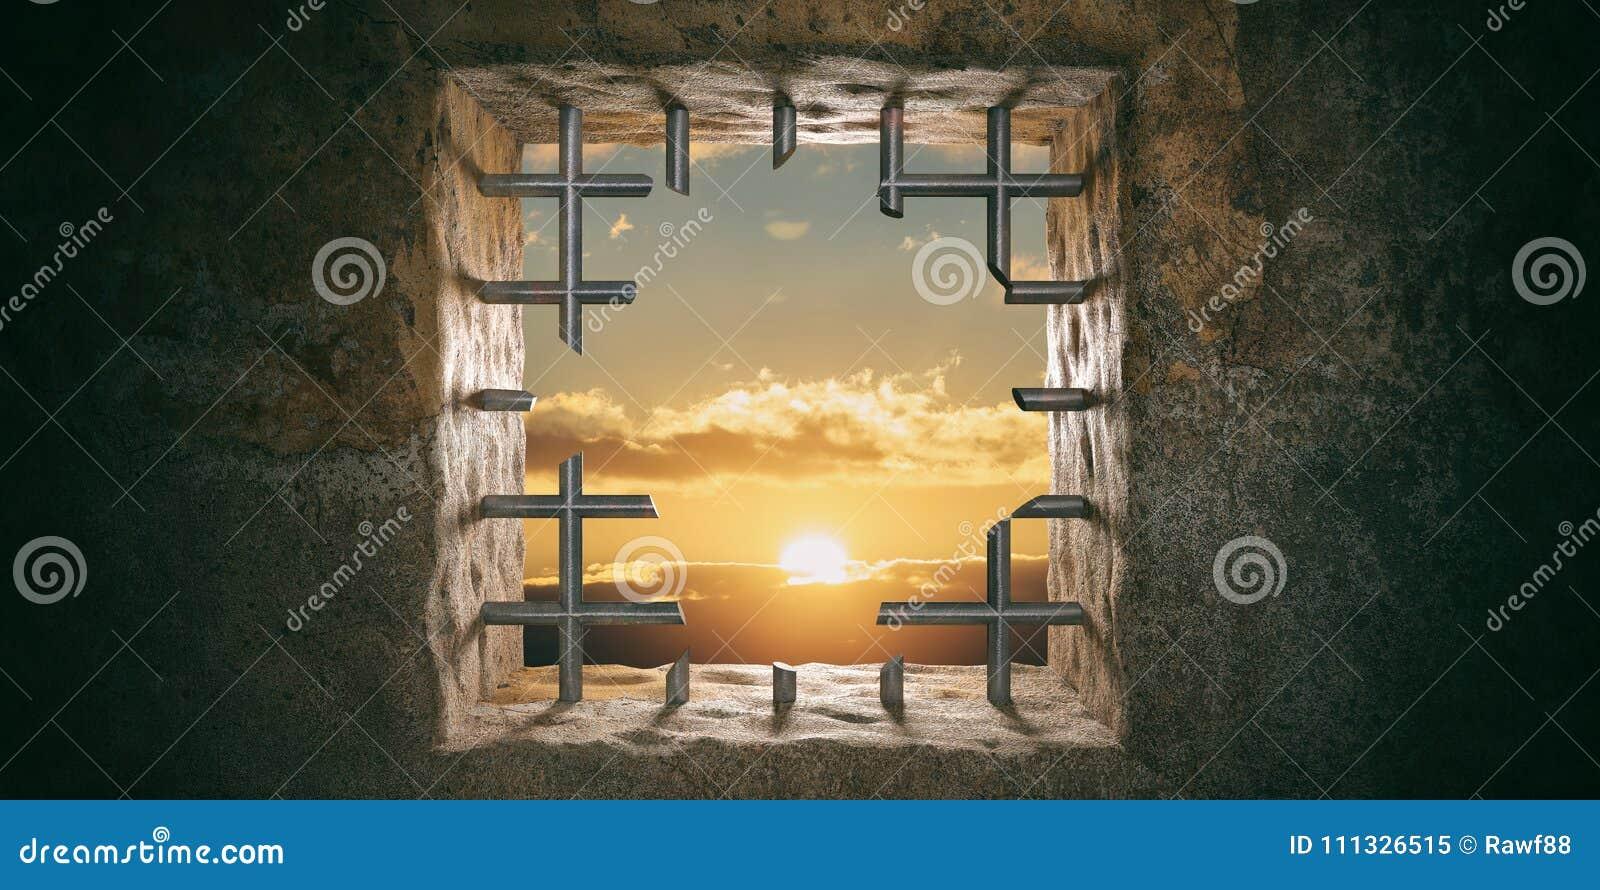 Избежание, свобода Тюрьма, окно с отрезанными барами, заход солнца тюрьмы, взгляд восхода солнца иллюстрация 3d